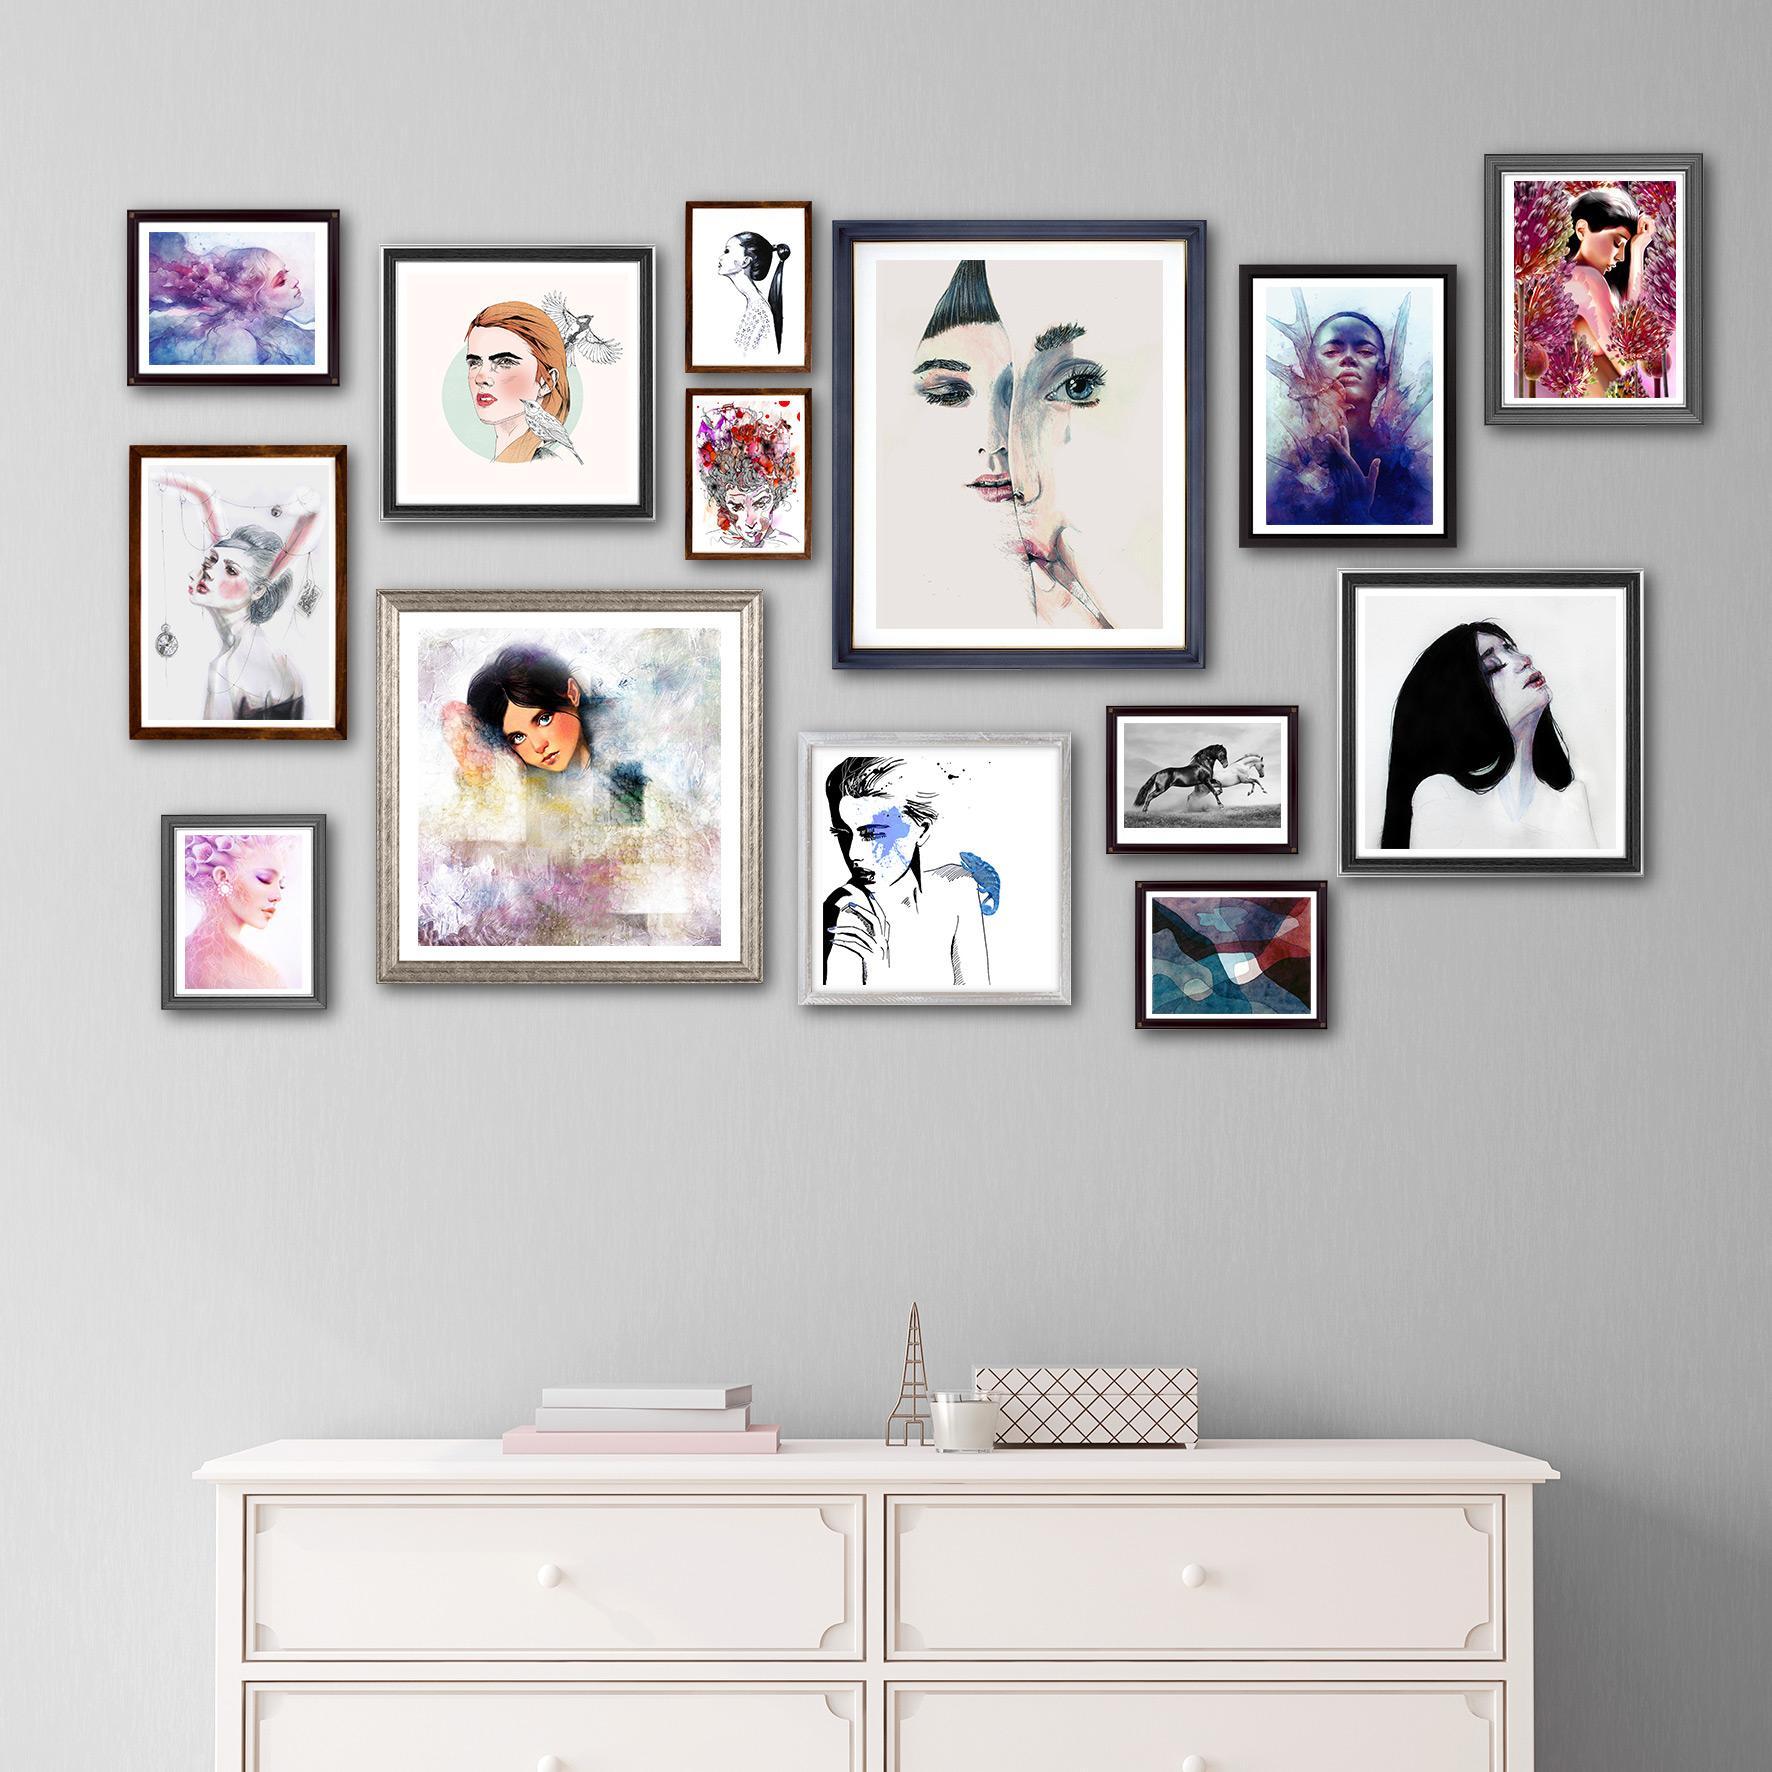 bild aufh ngen bilder ideen couchstyle. Black Bedroom Furniture Sets. Home Design Ideas